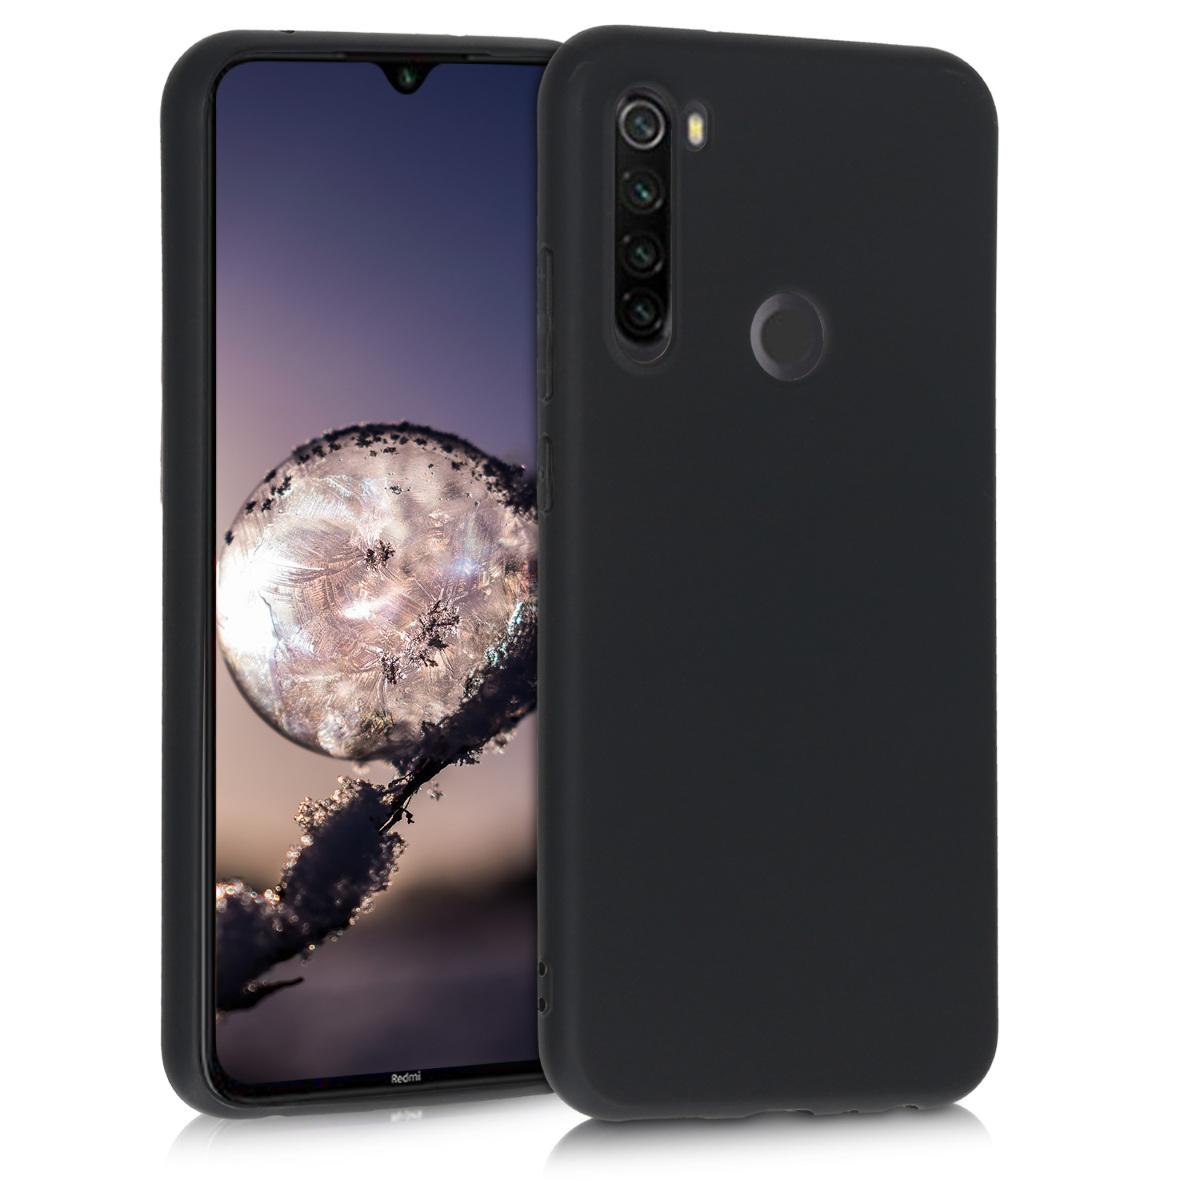 KW Θήκη Σιλικόνης Xiaomi Redmi Note 8T - Black Matte (50956.47)